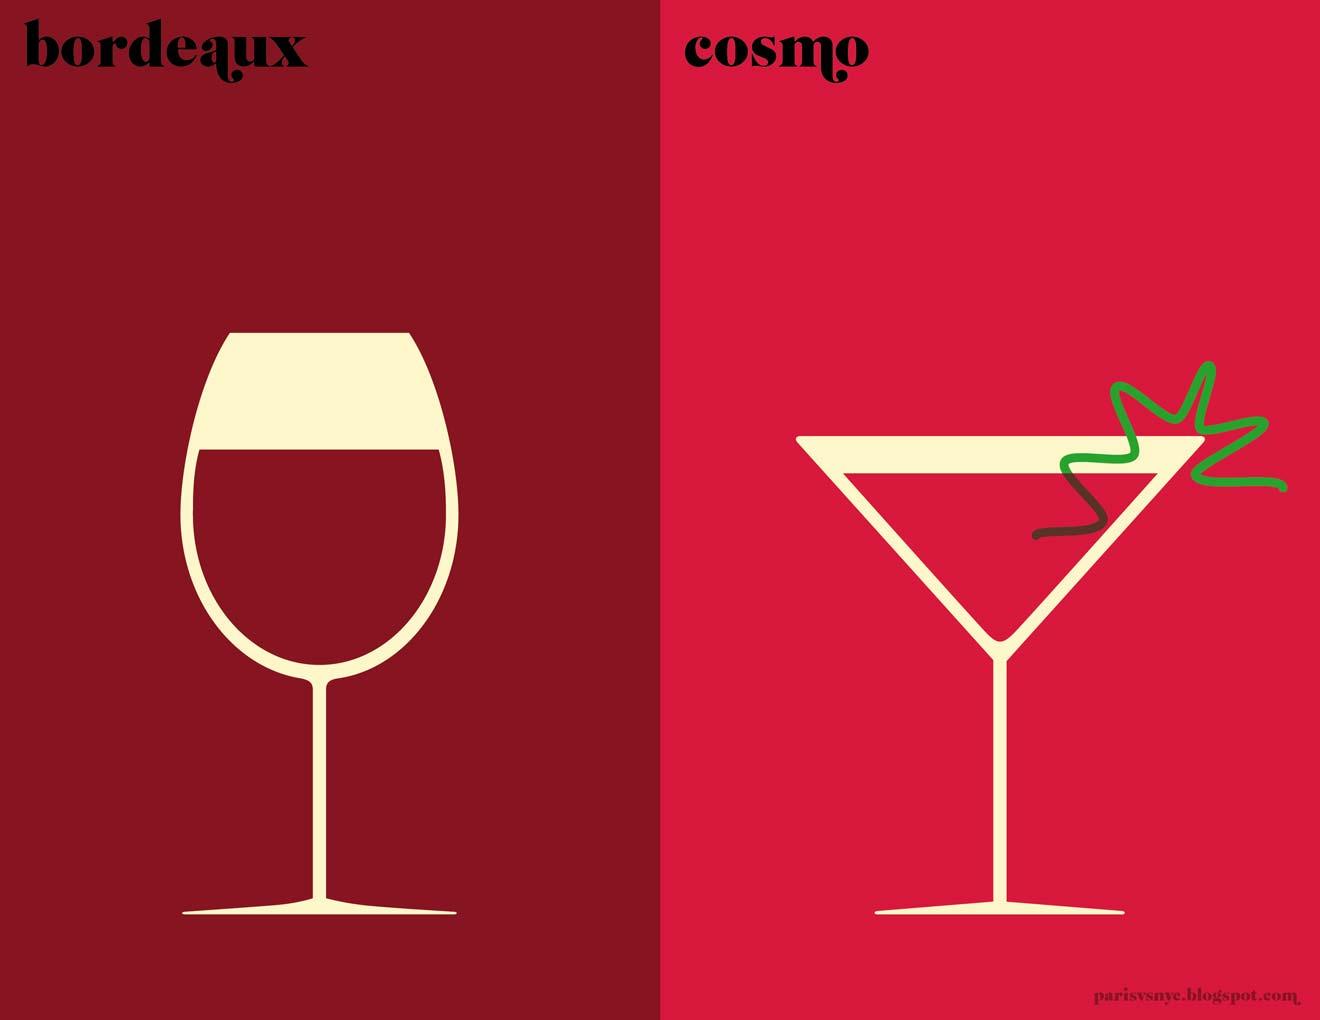 paris vs new york as seen by french graphic artist vahram muratyan